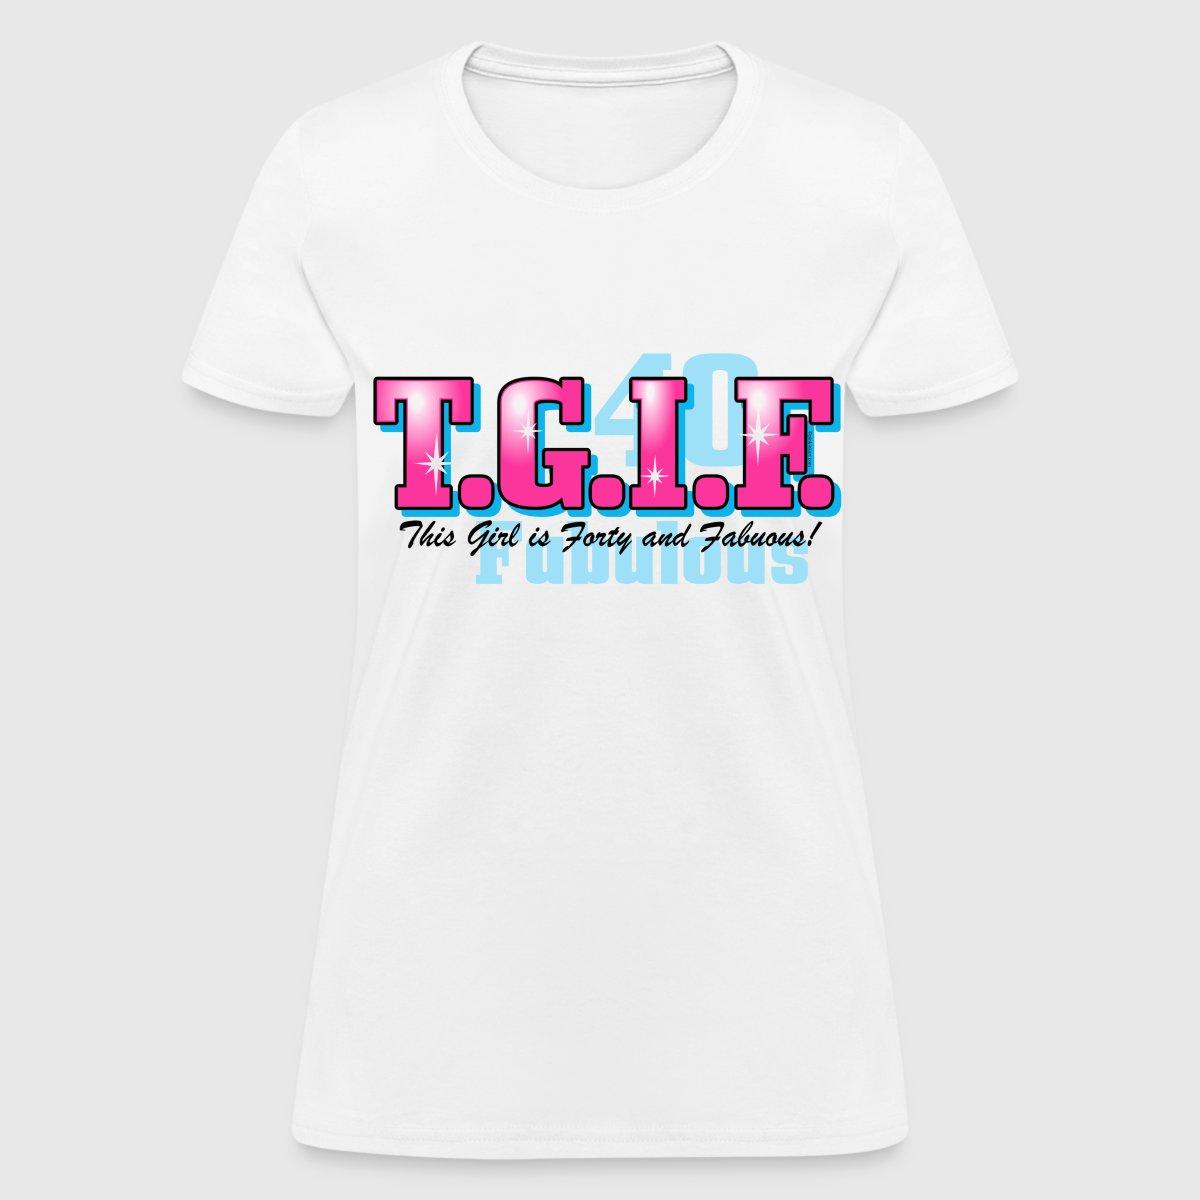 00fdba130 40th Birthday Shirts For Women